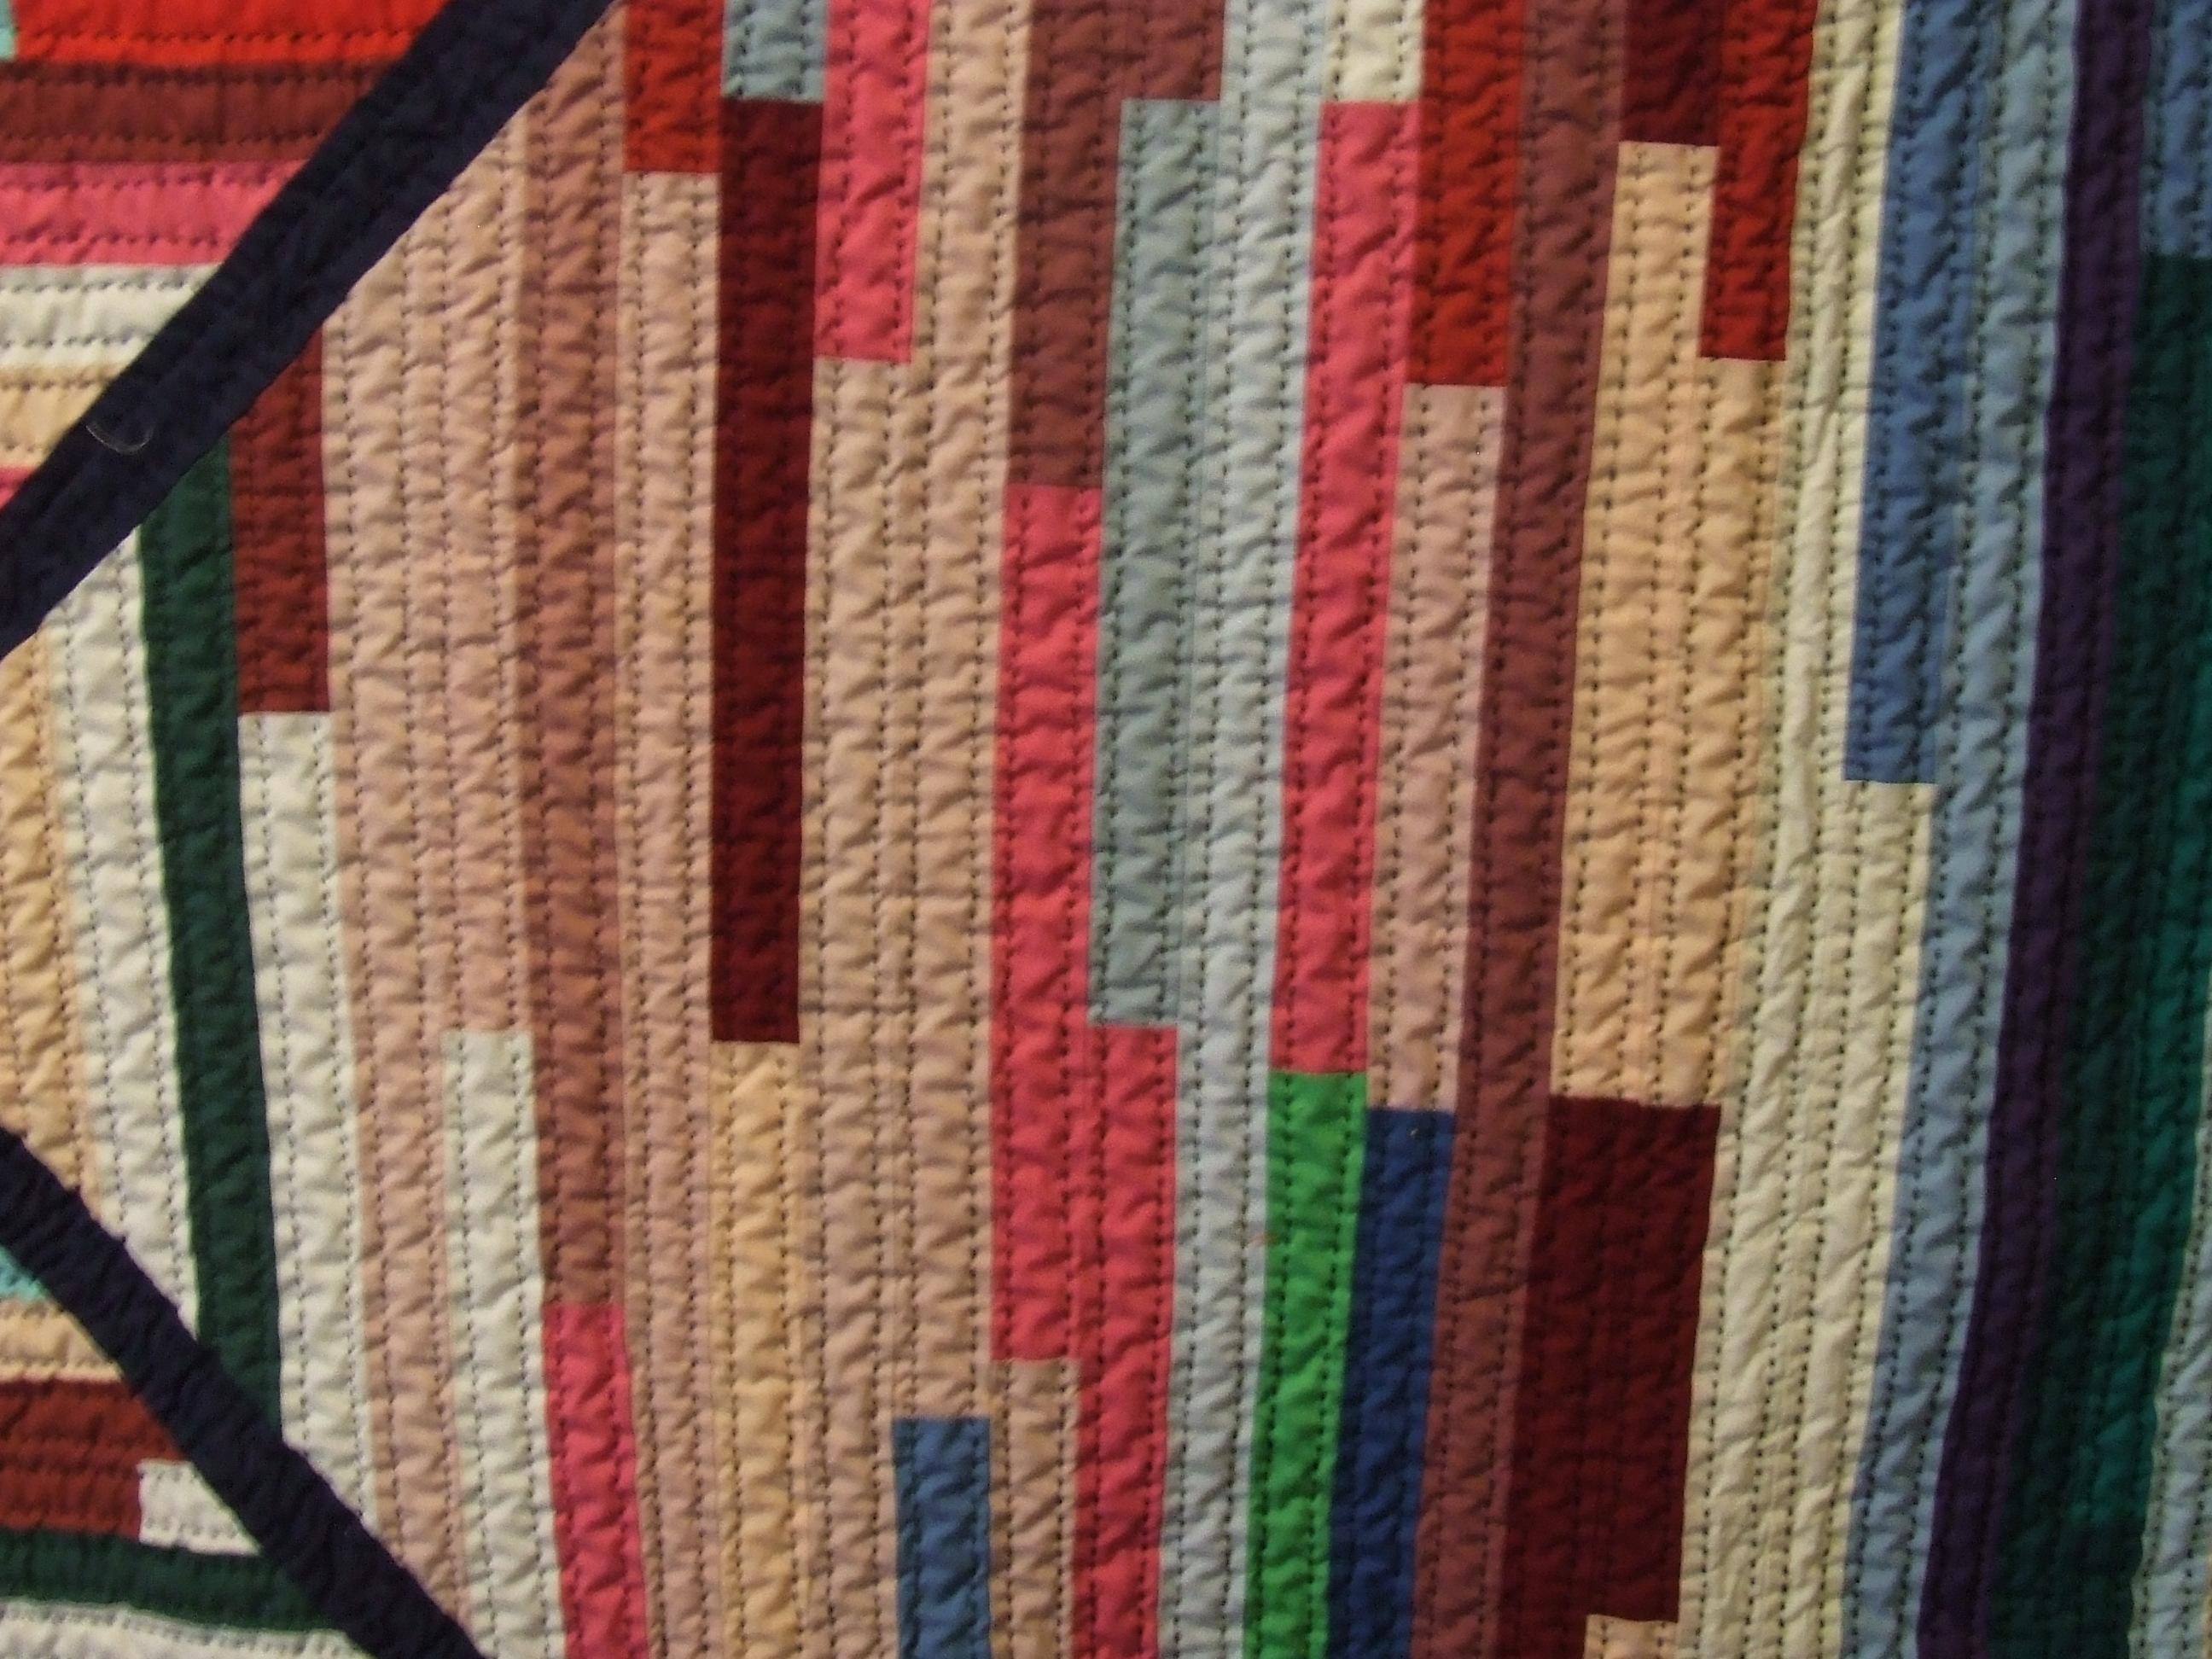 Vintage Strip Quilt Finished | Tim Latimer - Quilts etc : strip quilts - Adamdwight.com